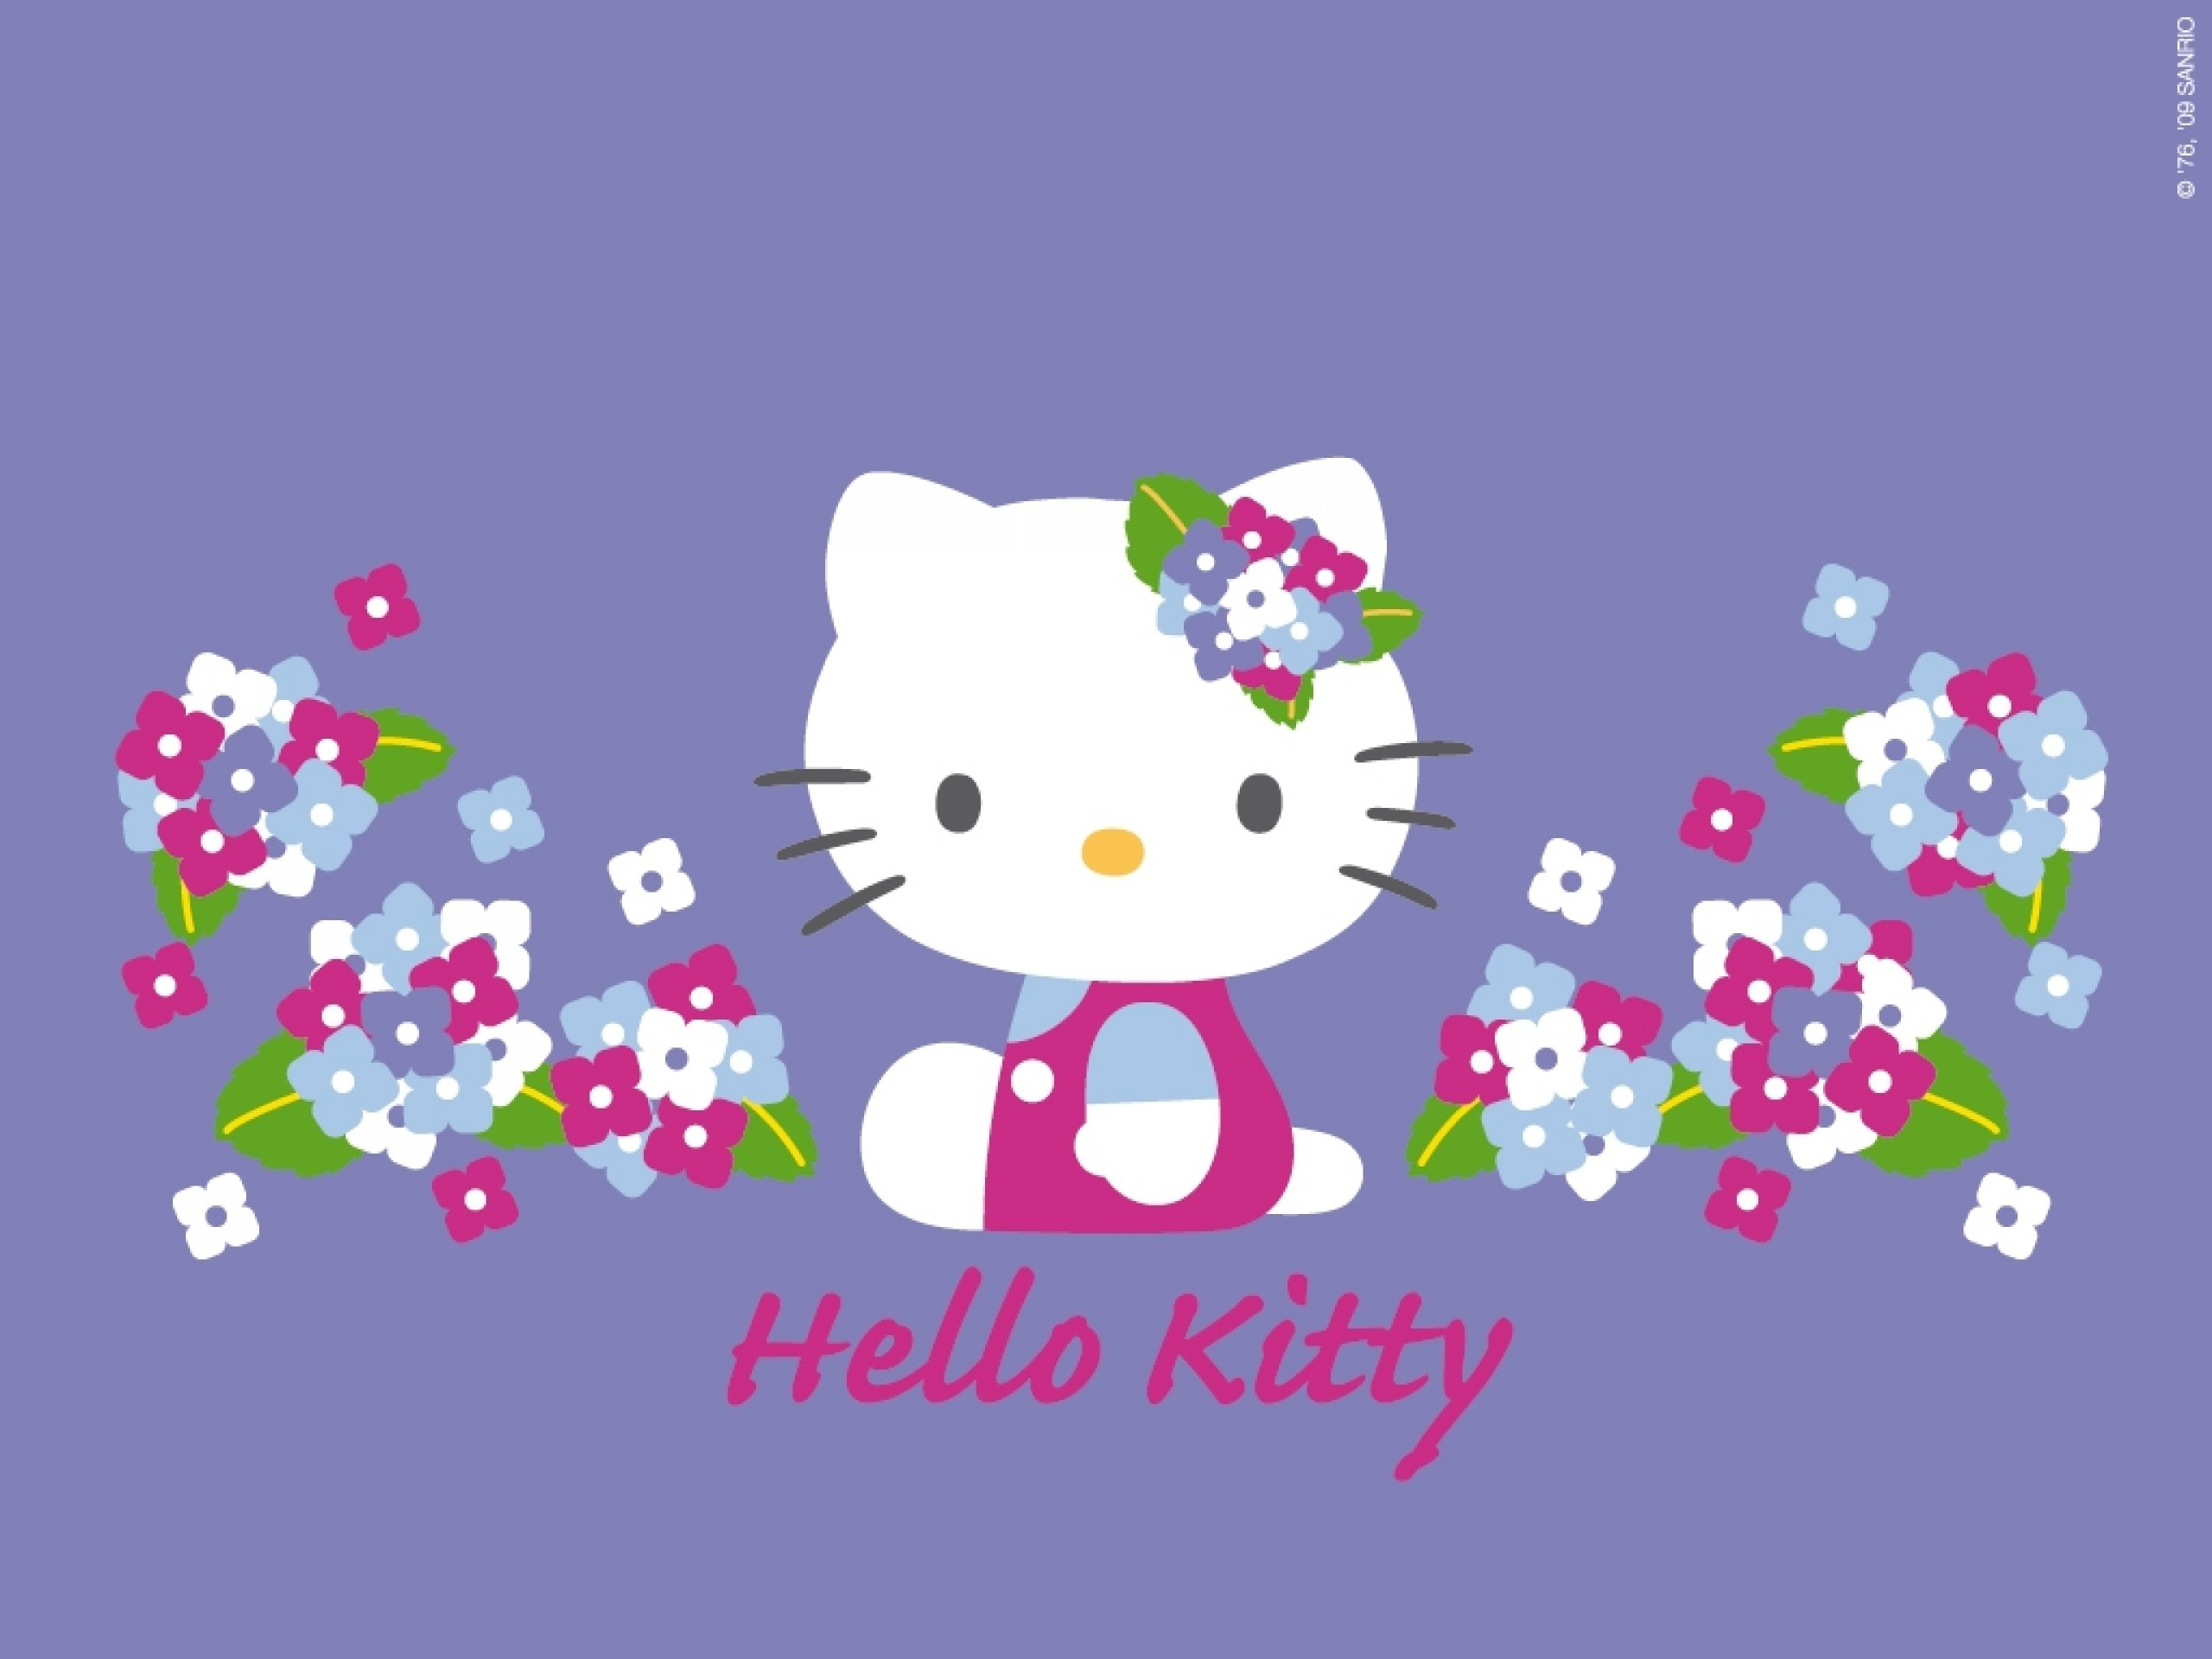 Cute Rilakkuma Wallpaper Hello Kitty Spring Wallpaper 183 ① Wallpapertag